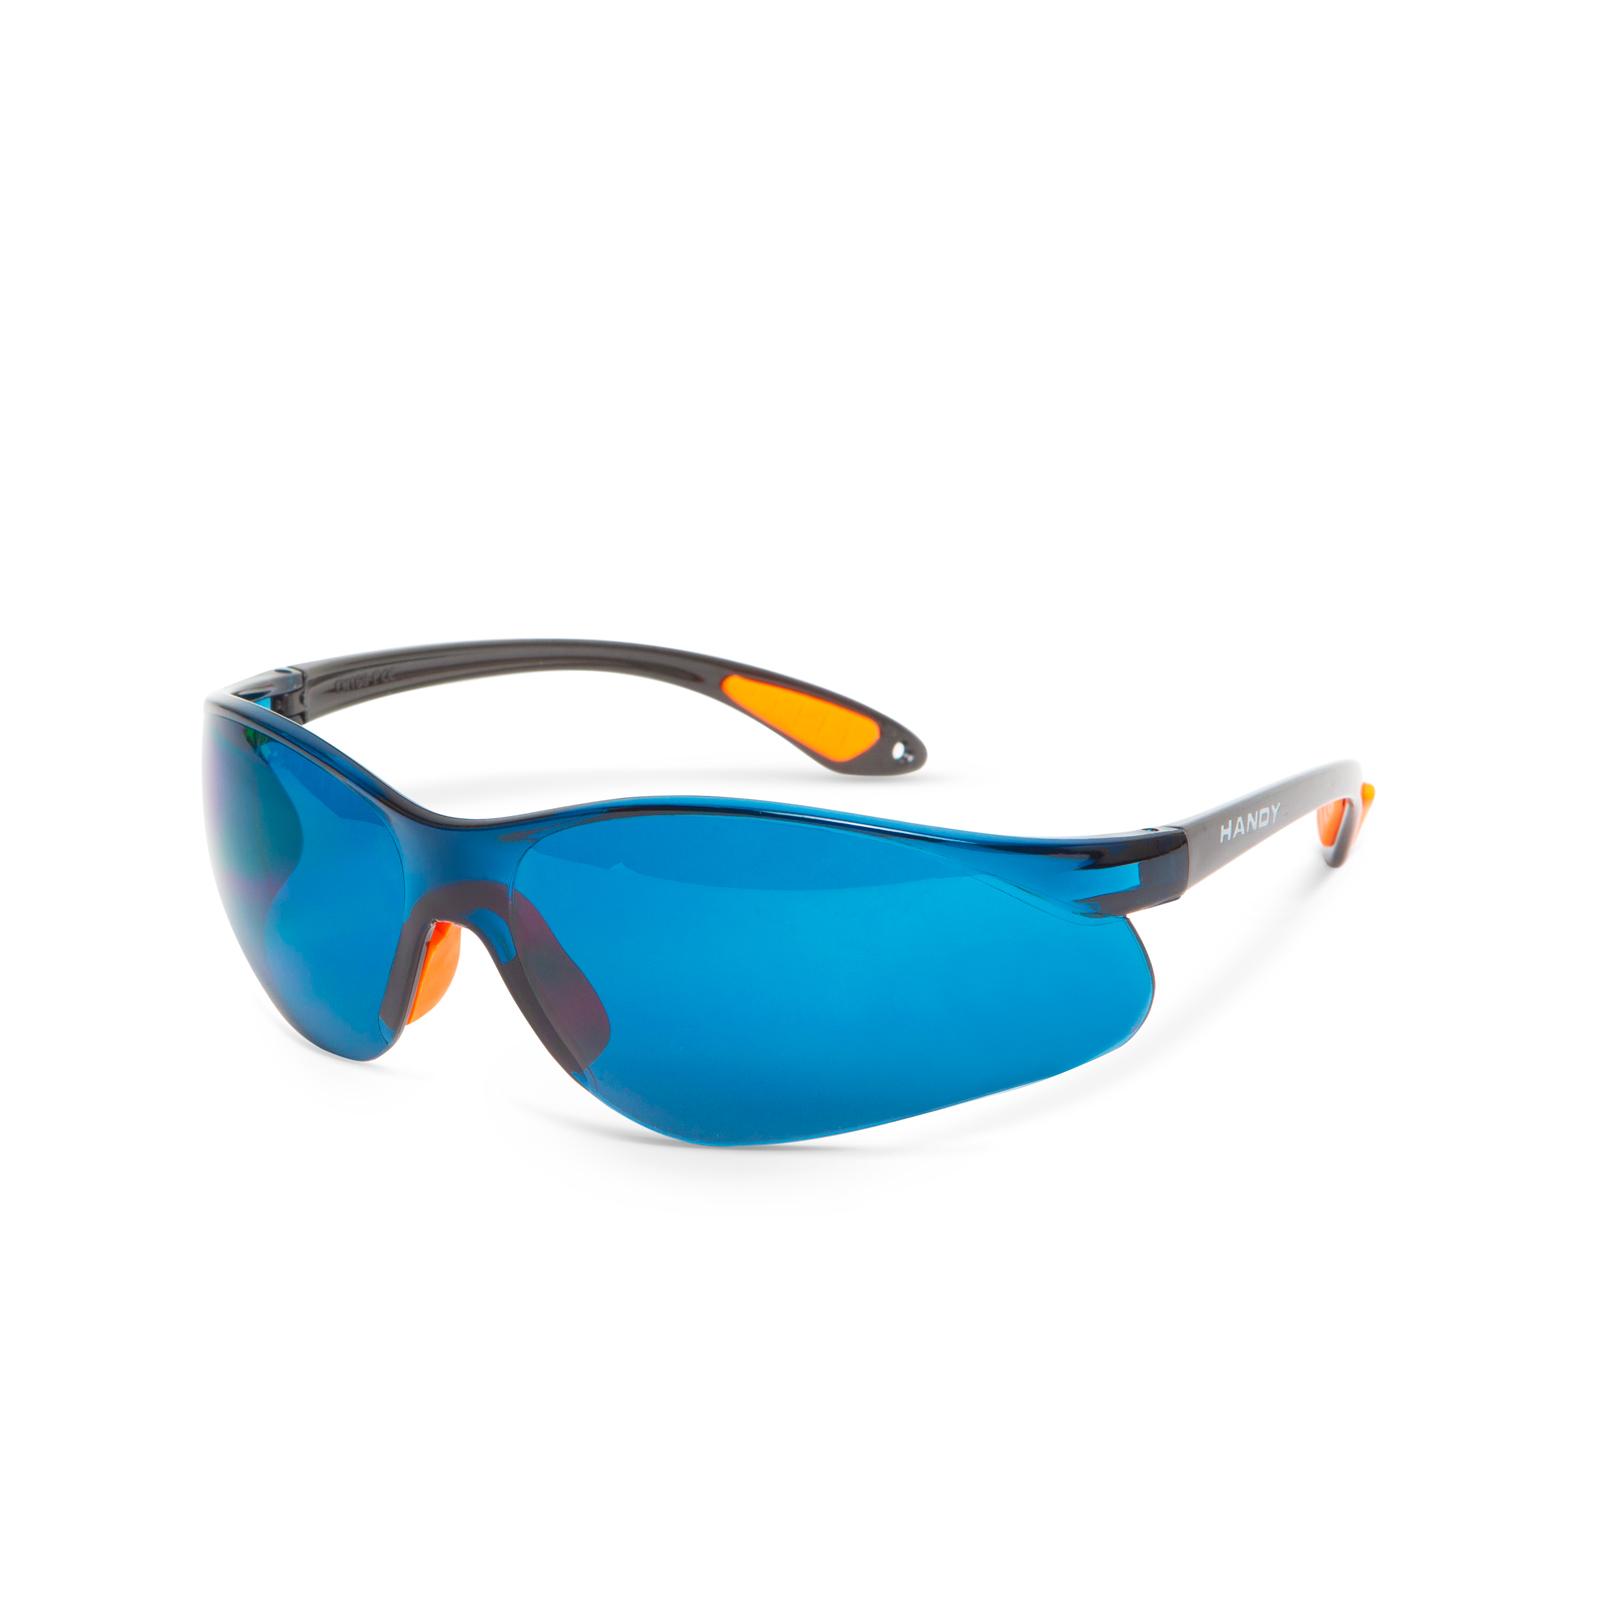 Ochelari de rotectie cu protectie UV, albastru